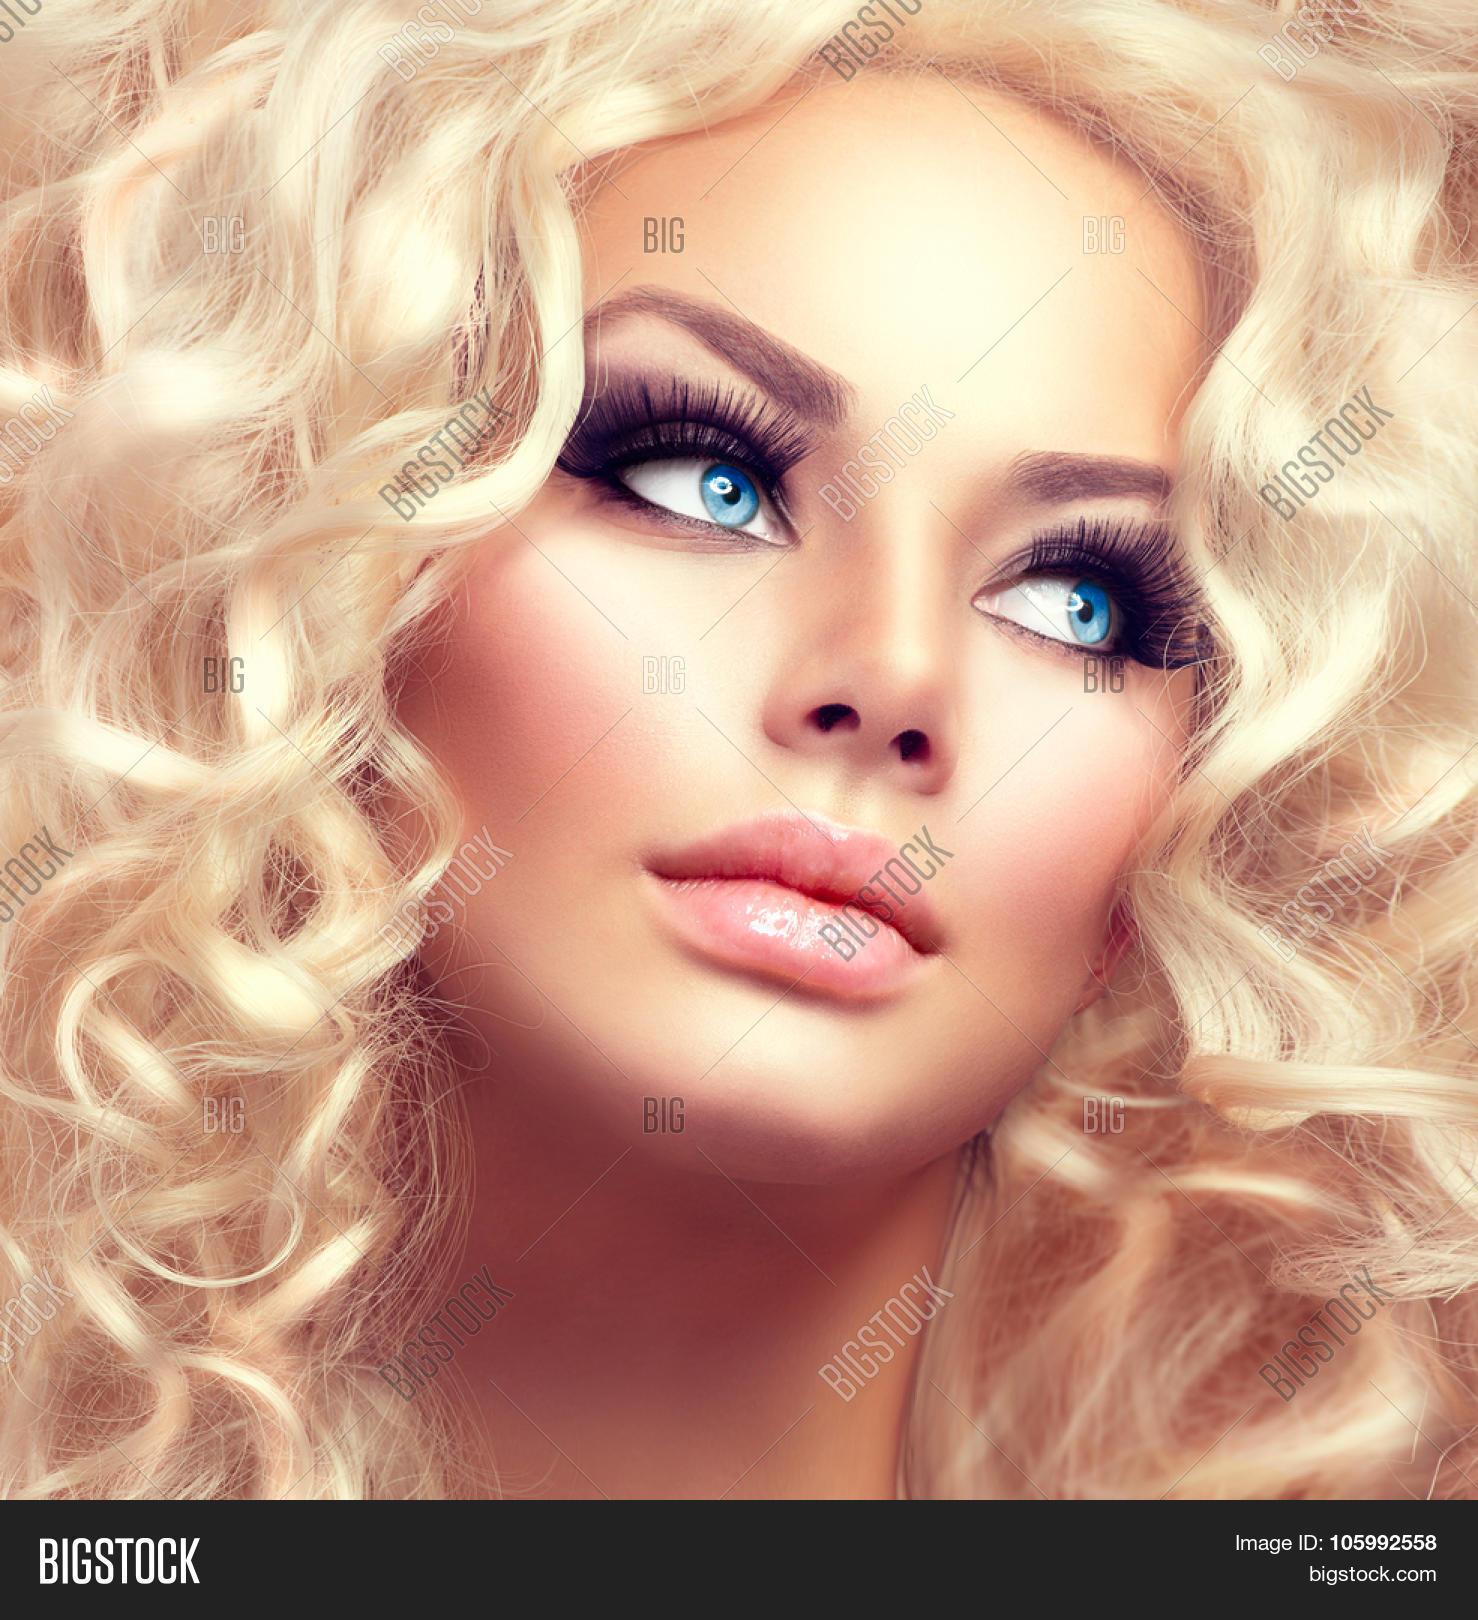 Beauty Girl Healthy Image Photo Free Trial Bigstock